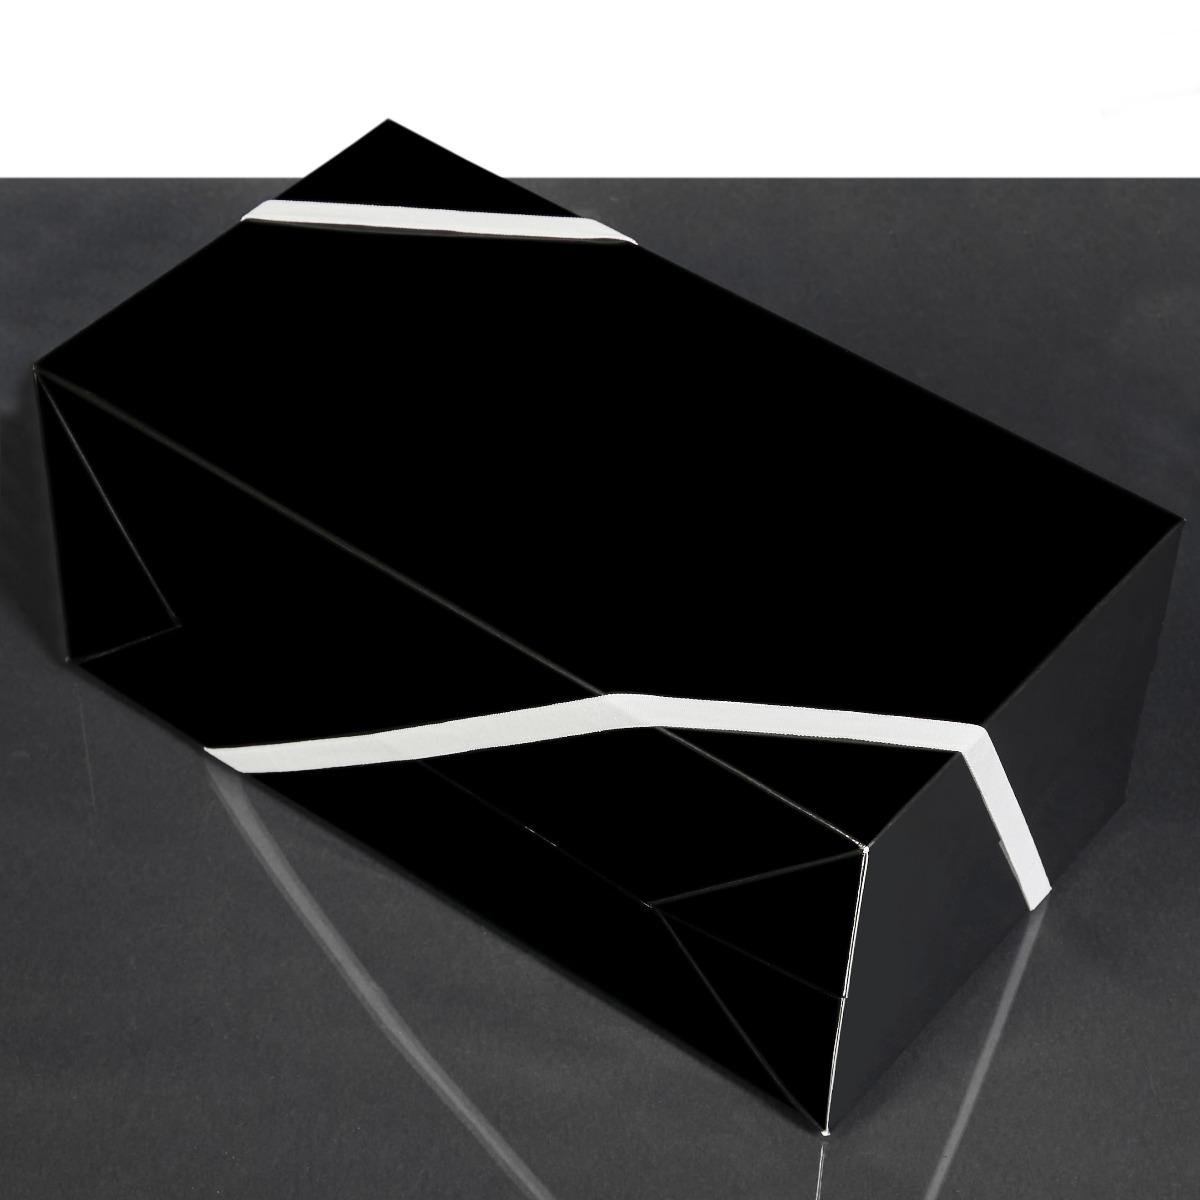 Do-It-Yourself Medium Glossy Black Gift Box Add-On